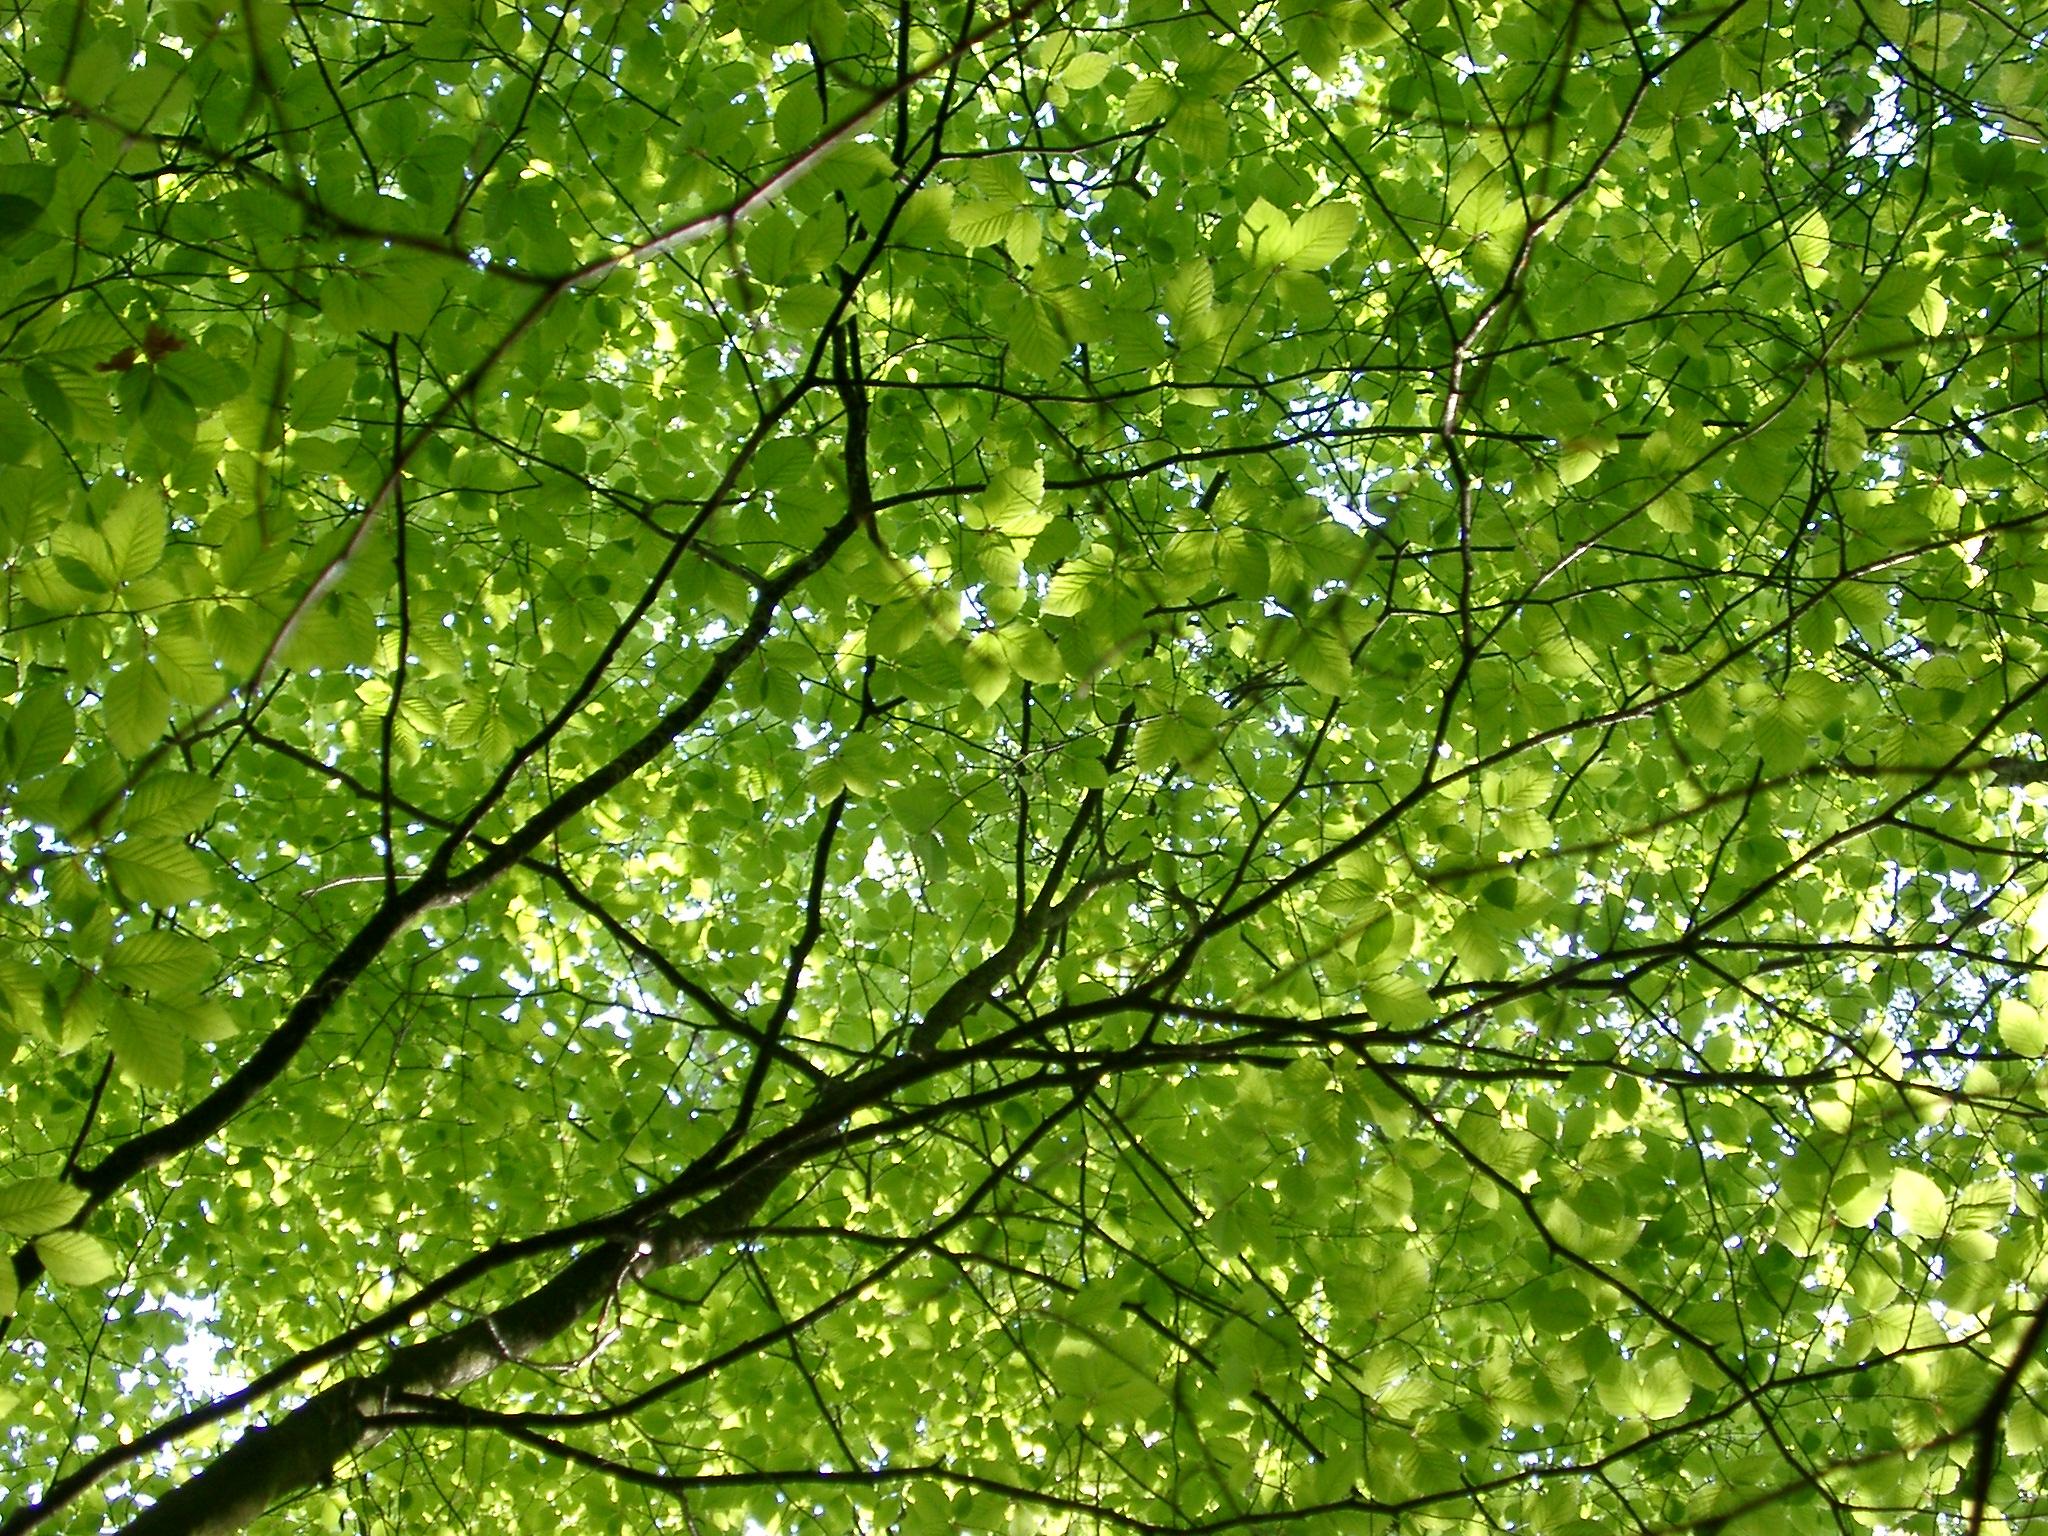 free stock photo of oak trees photoeverywhere